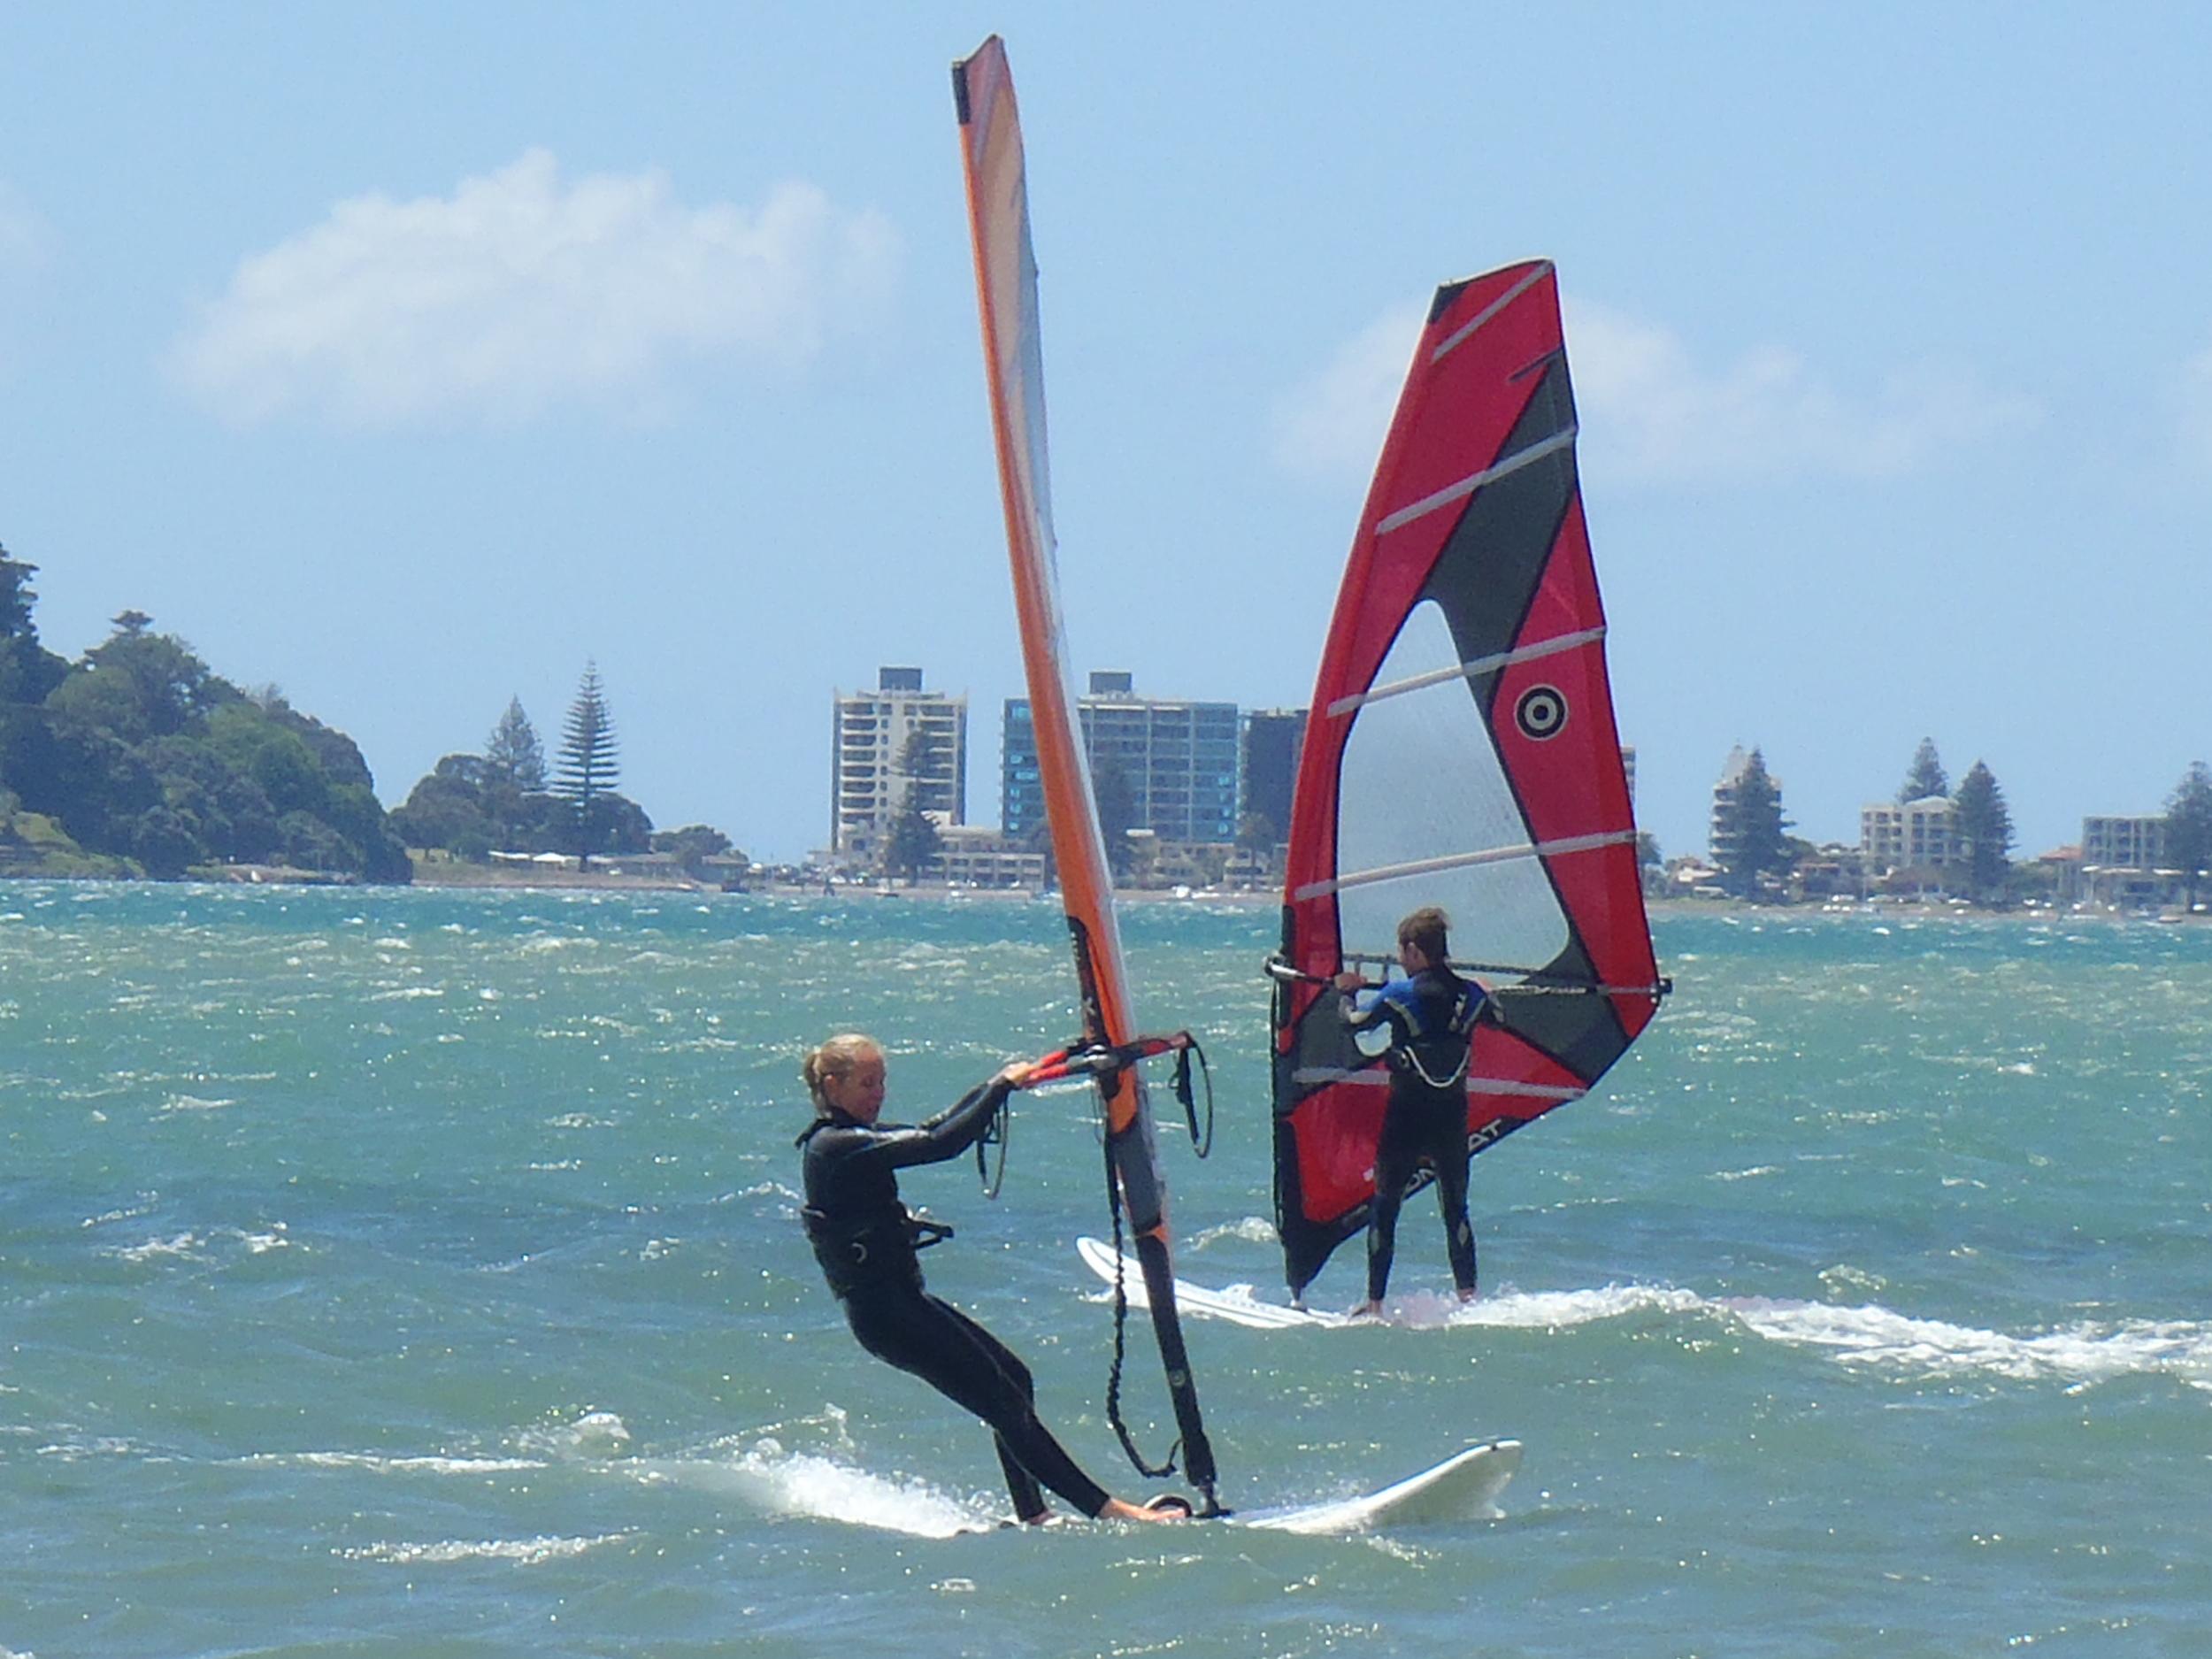 Learn to Windsurf in a weekend in Tauranga